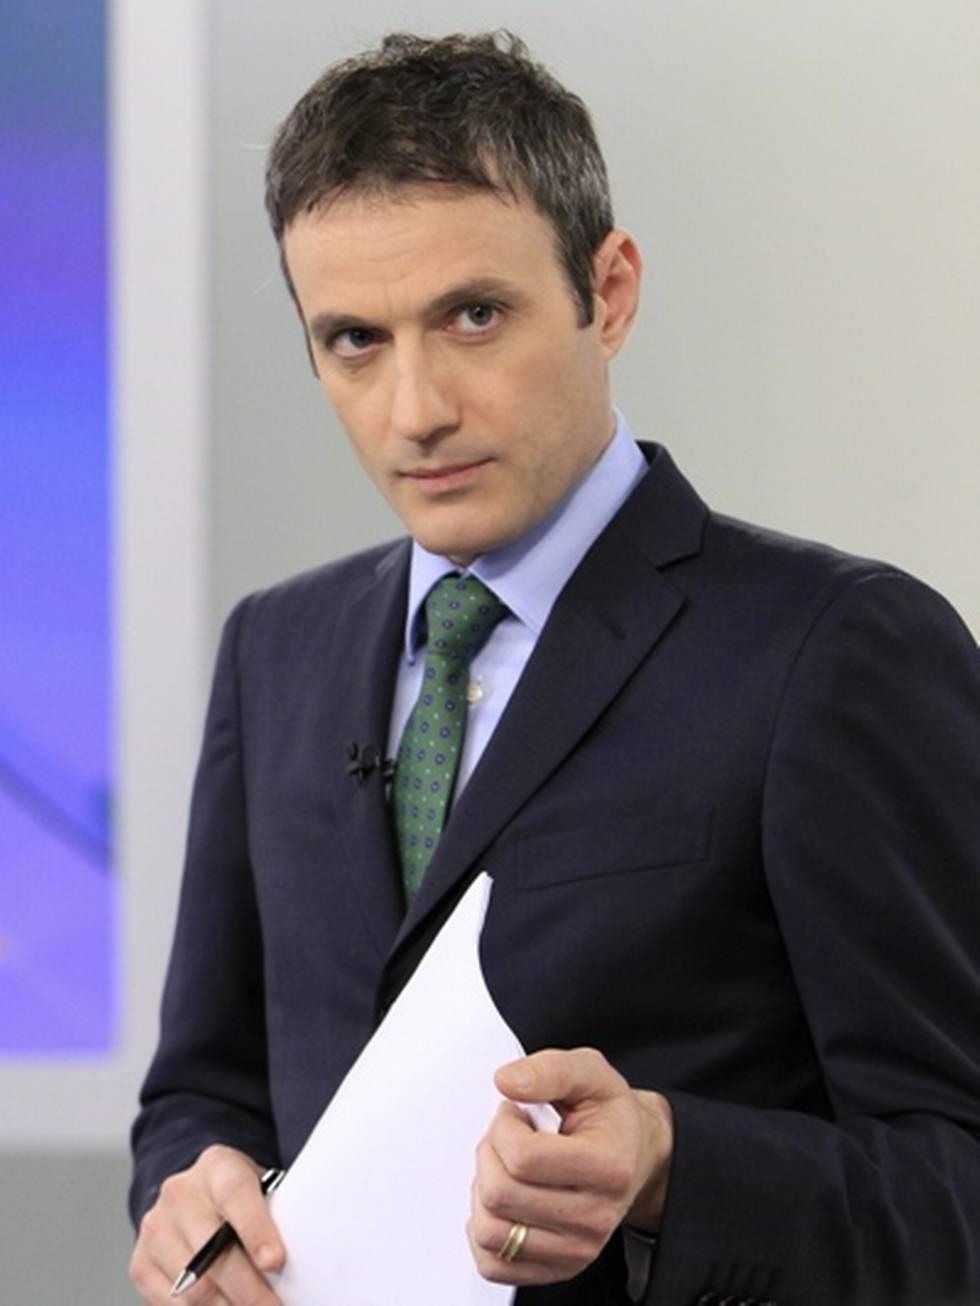 Christian Romelli